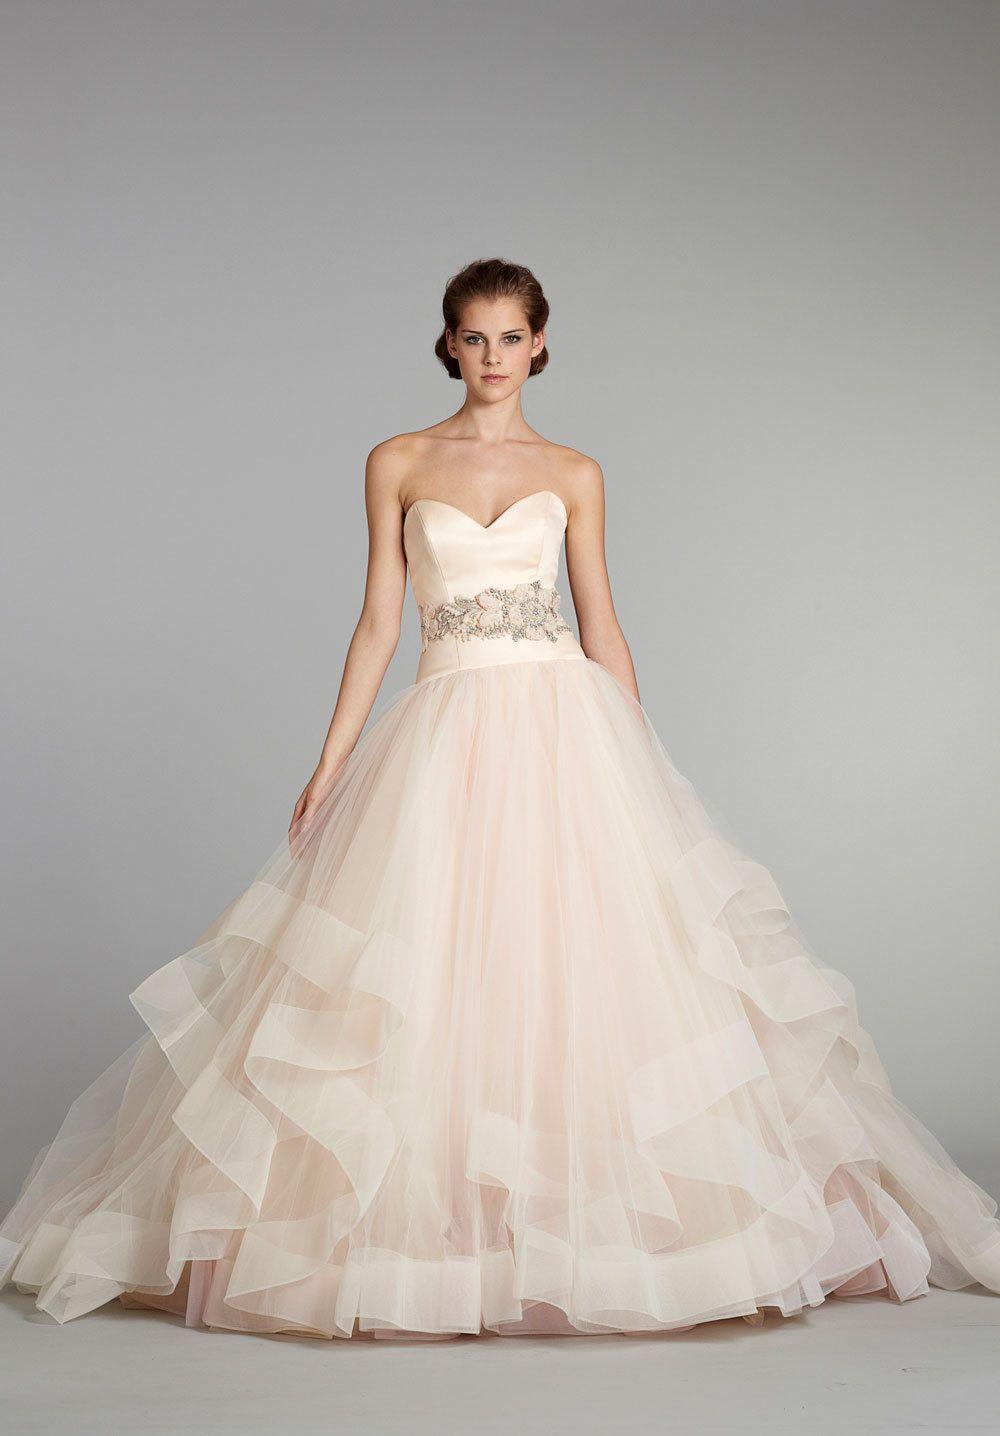 Lazaro bridal 2013 unique wedding gowns wedding dresses